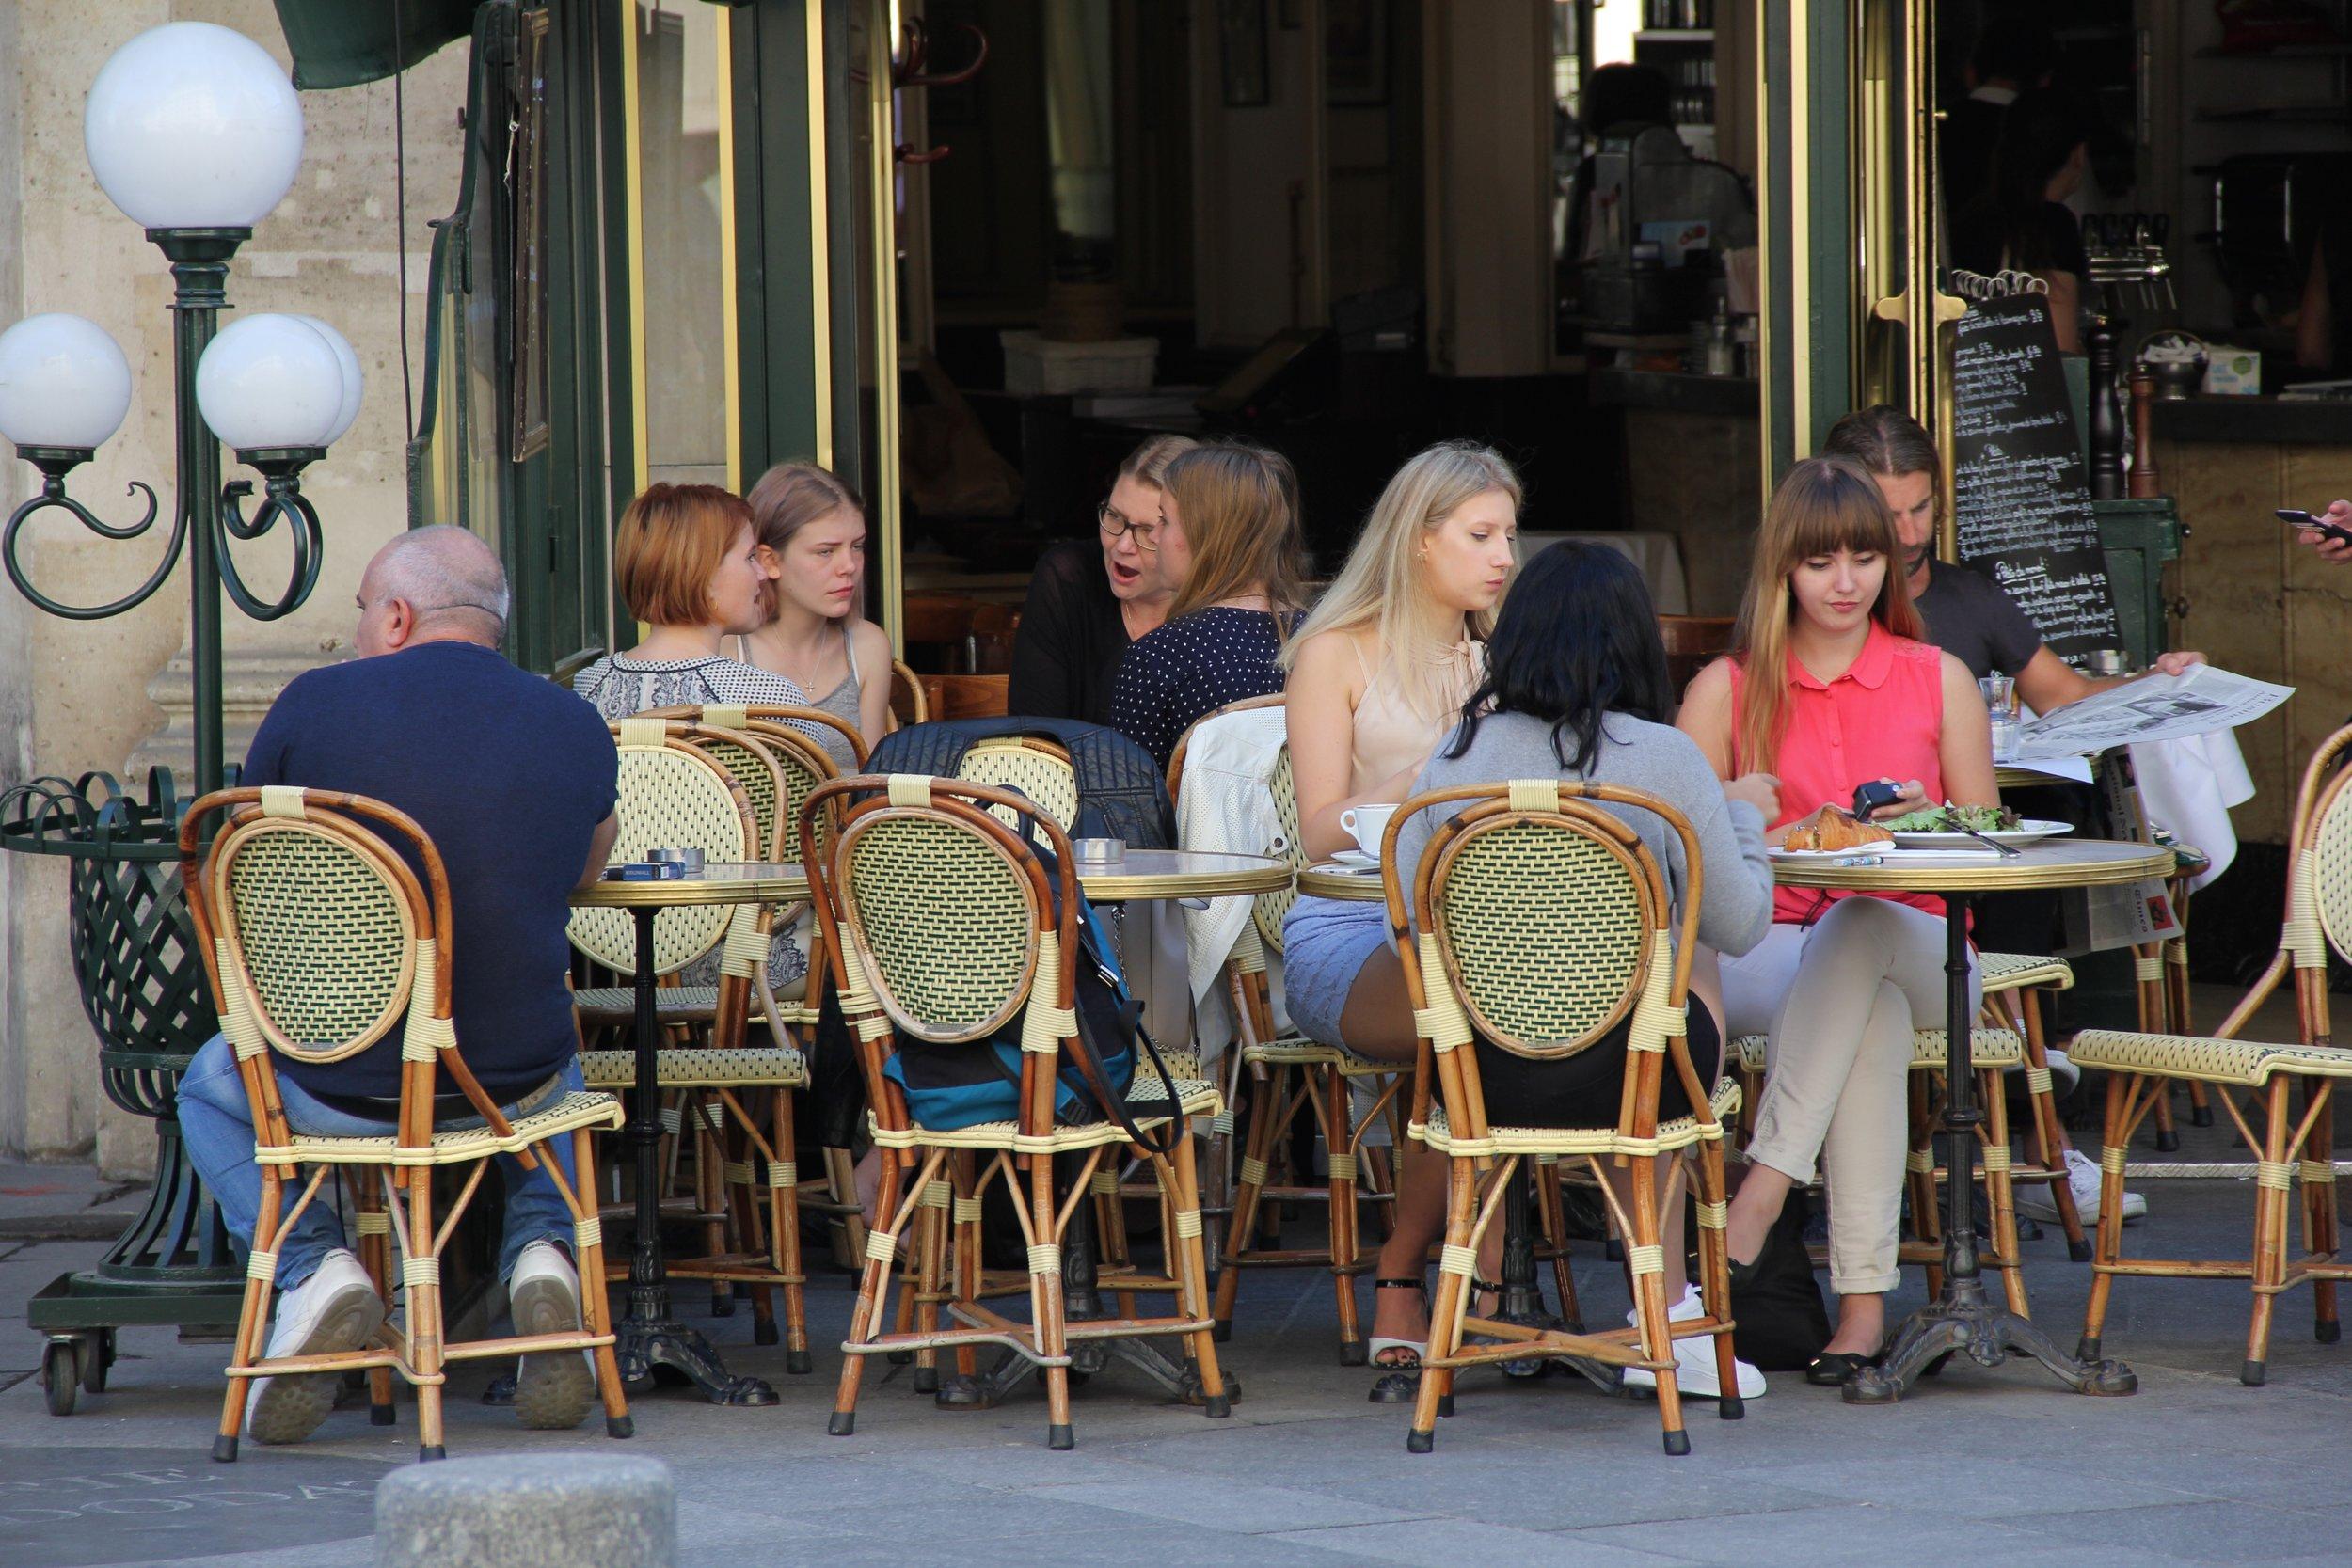 2016.09 Paris Edited 8171.jpg